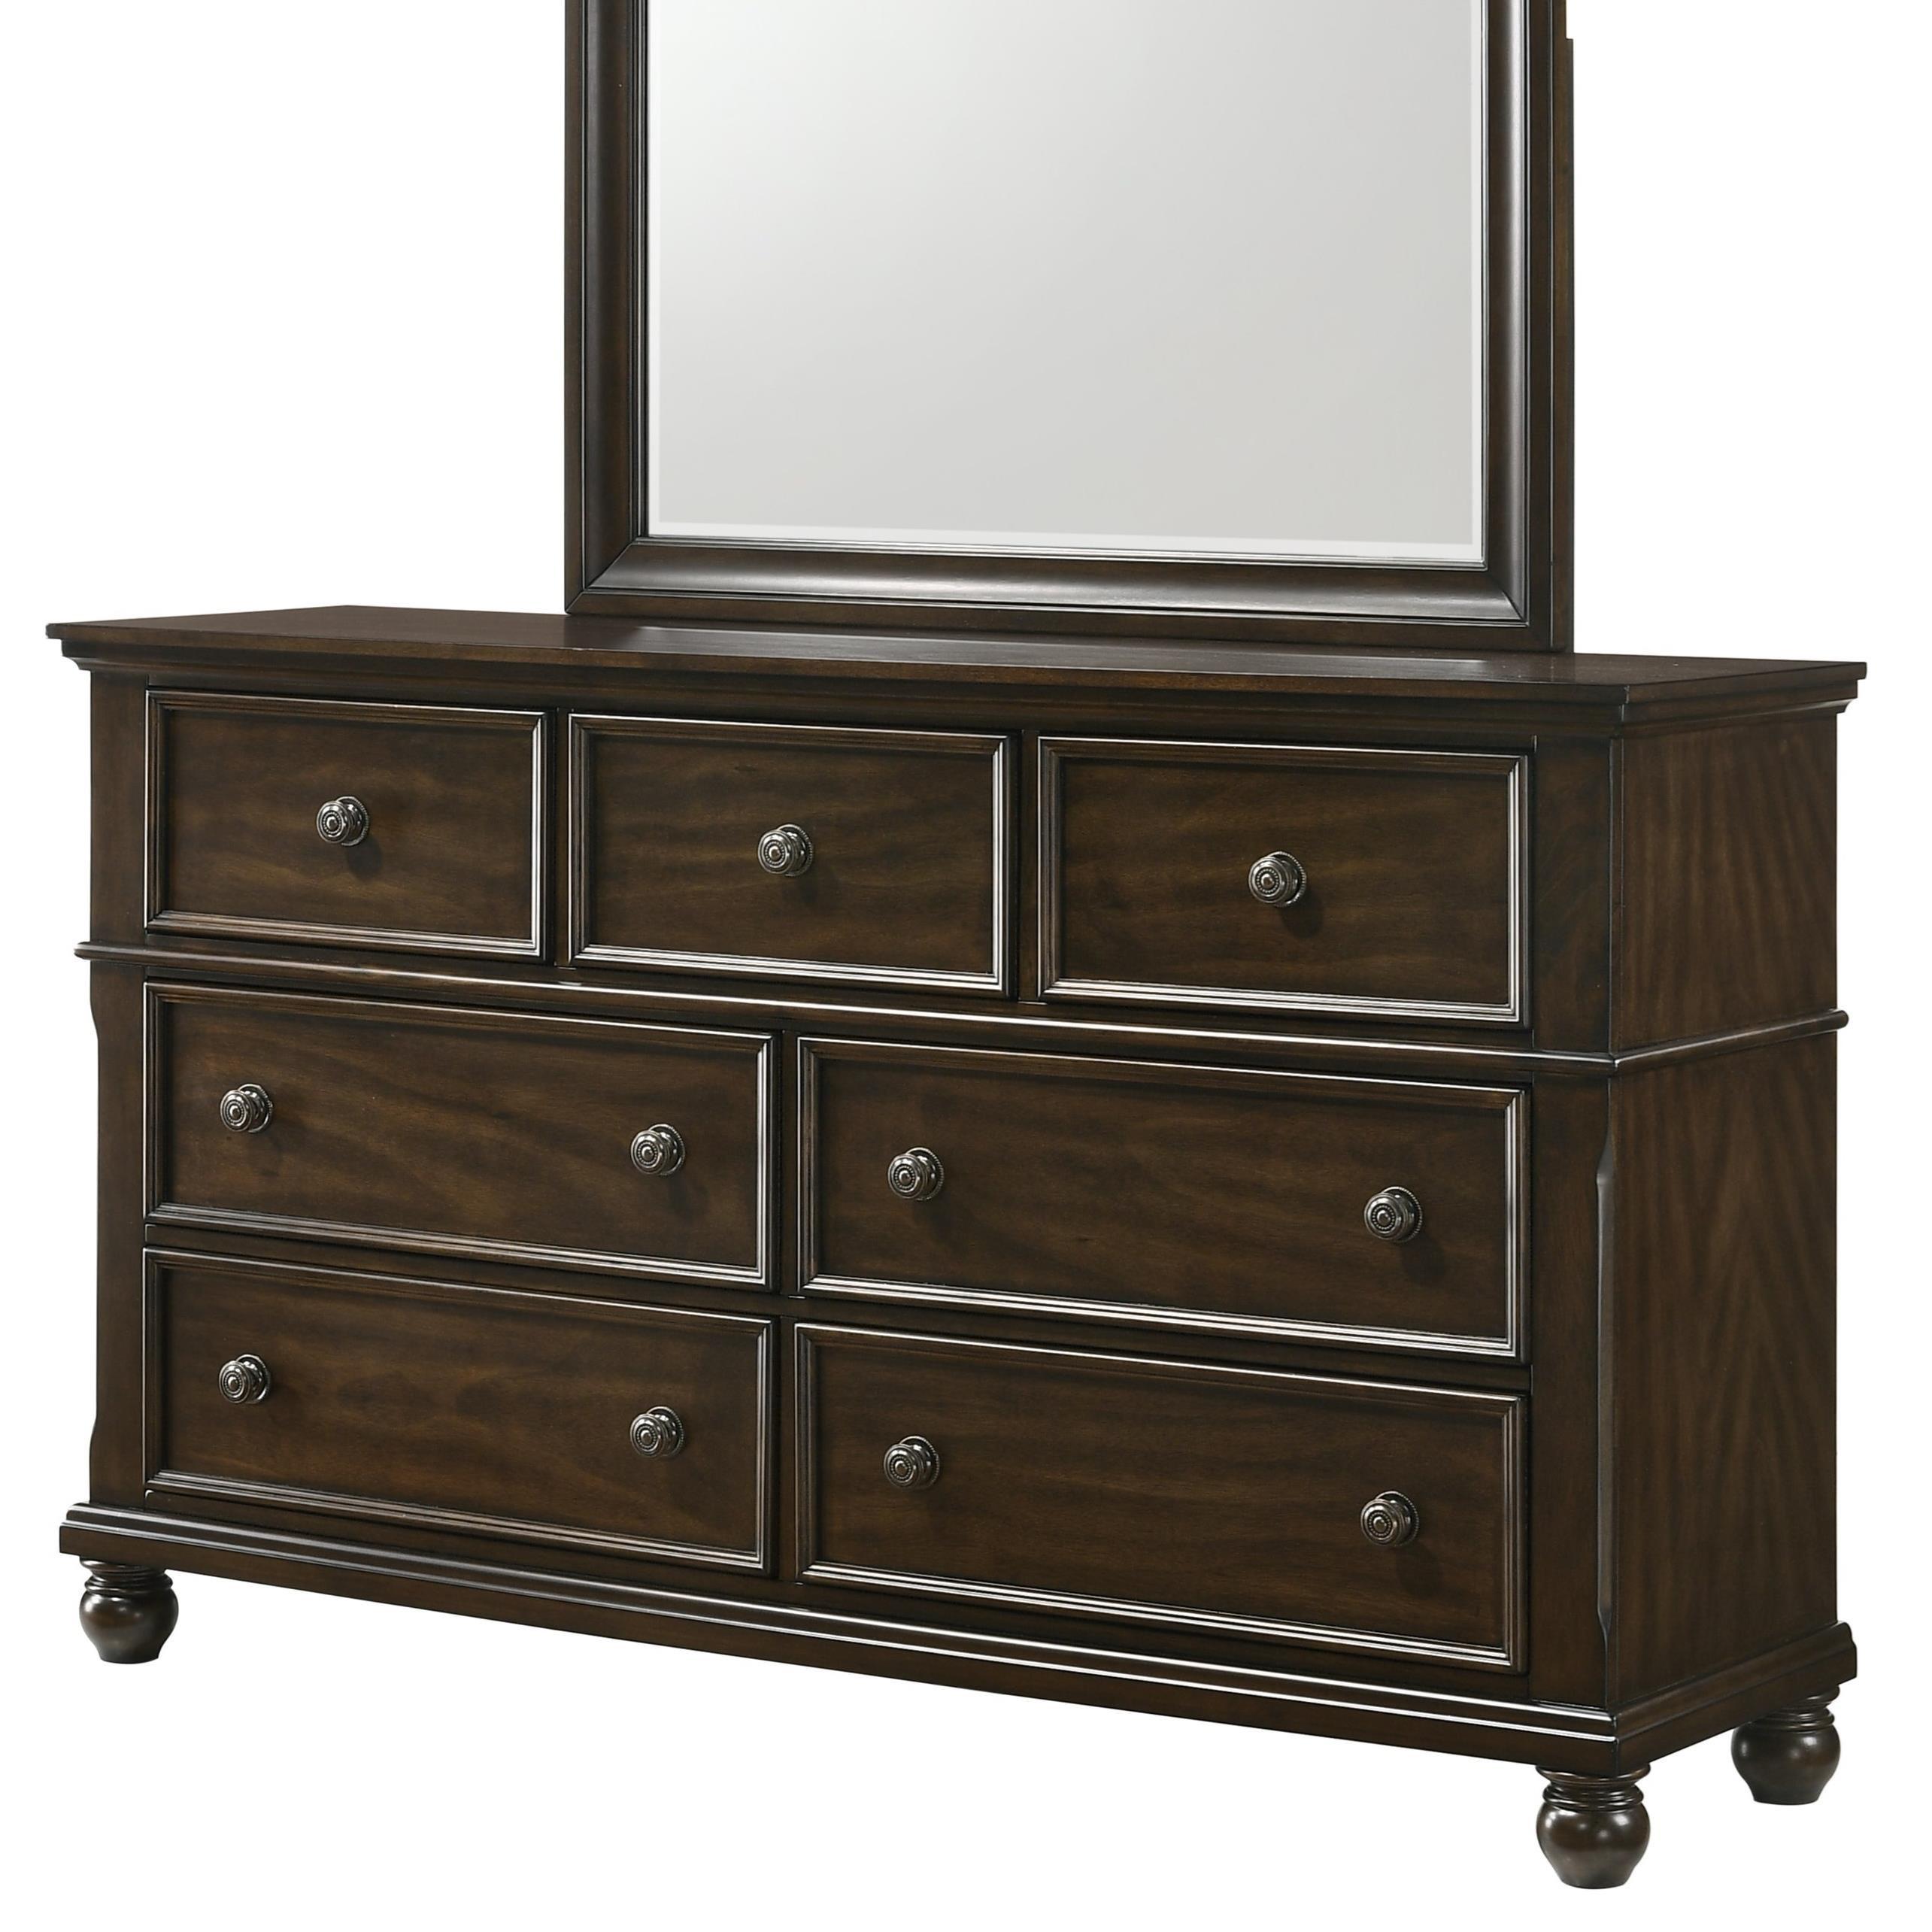 Lara Dresser by Crown Mark at Northeast Factory Direct